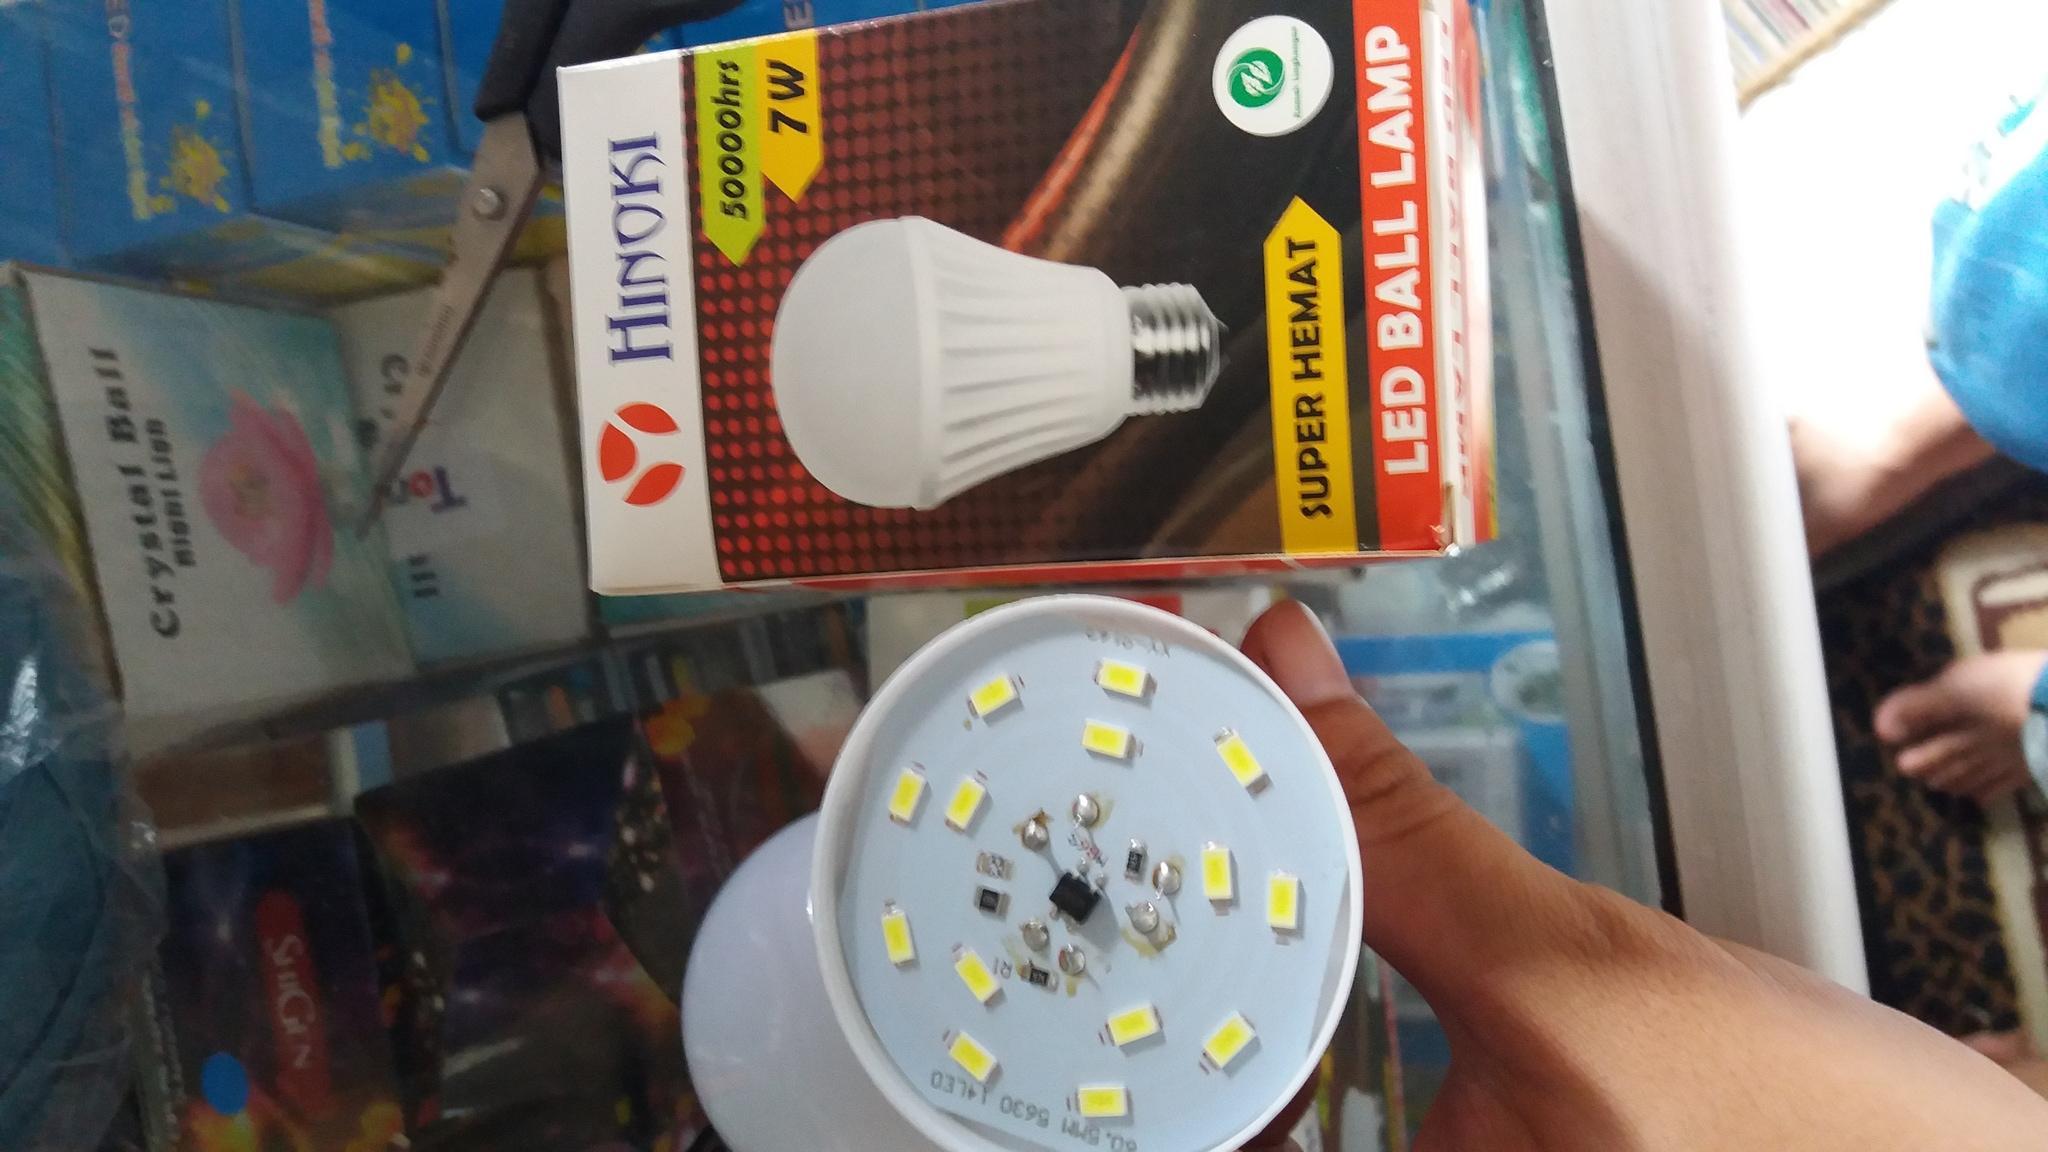 Cek Harga Led Bohlam Lampu 18 Watt 6 Pcs Hinomaru Hemat Energi Source · 224472 1321adc9